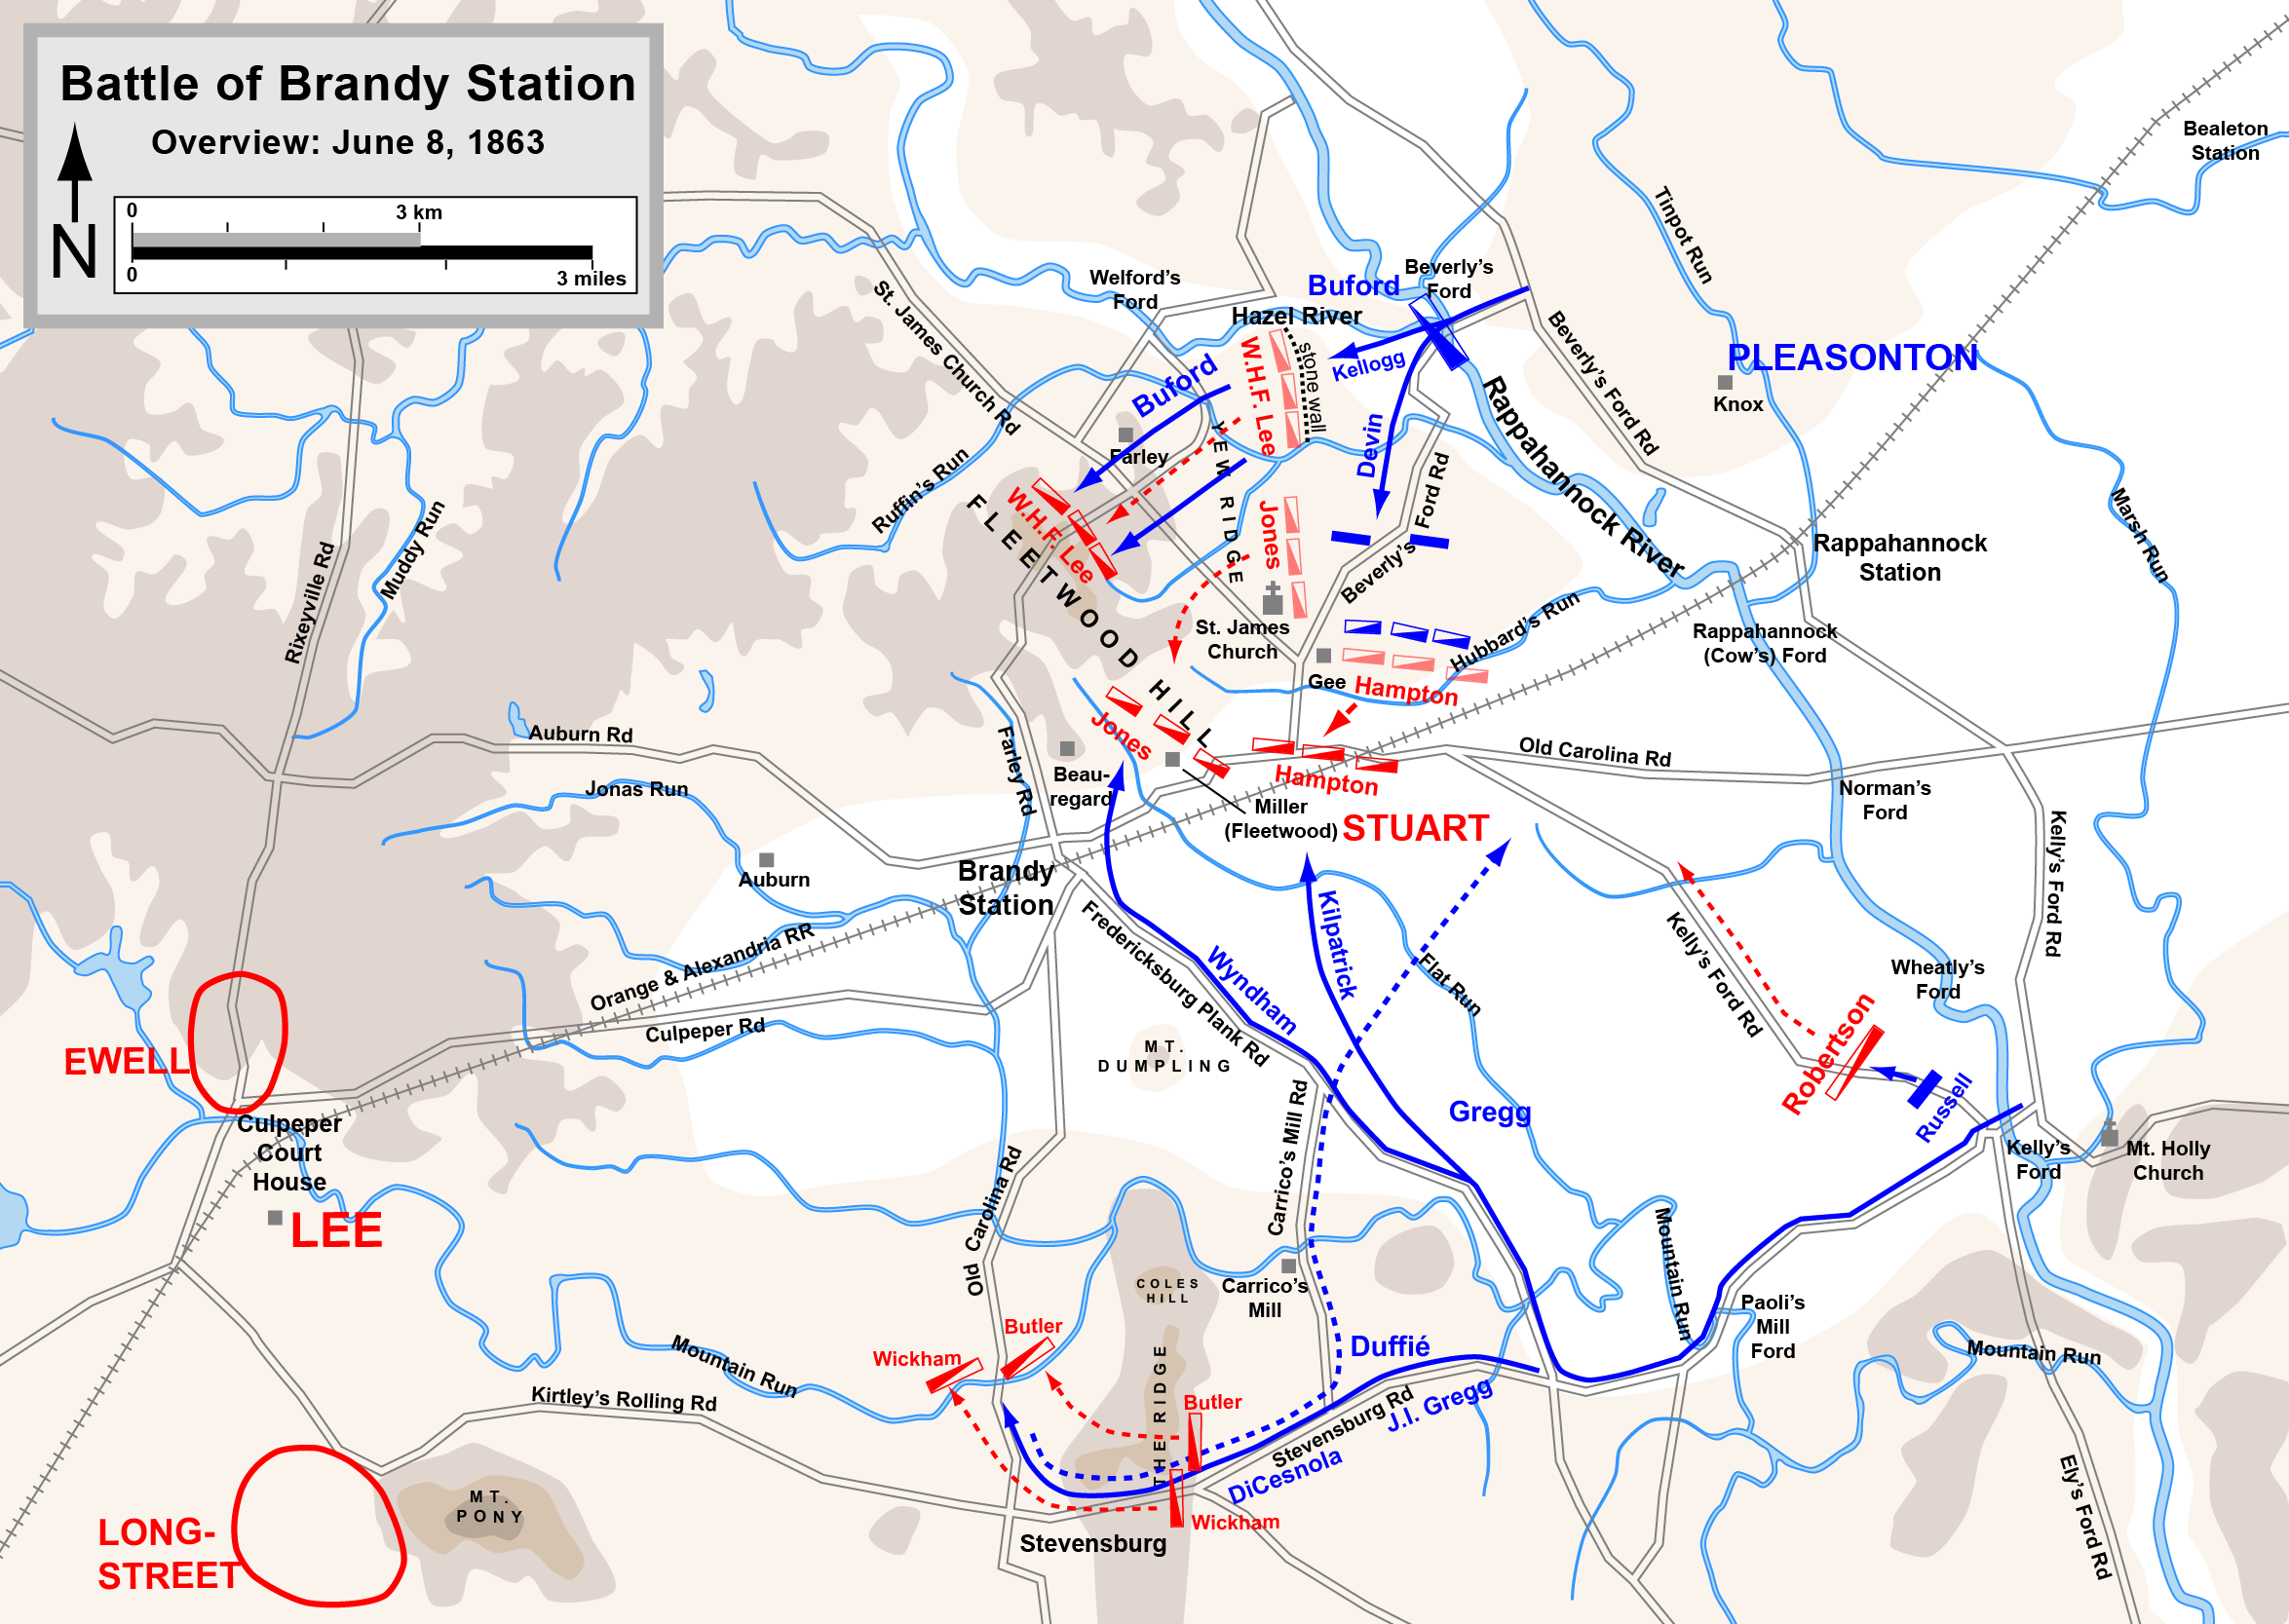 Gettysburg Wheatfield Google Search Gettysburg Campaign And - Battle of gettysburg map us